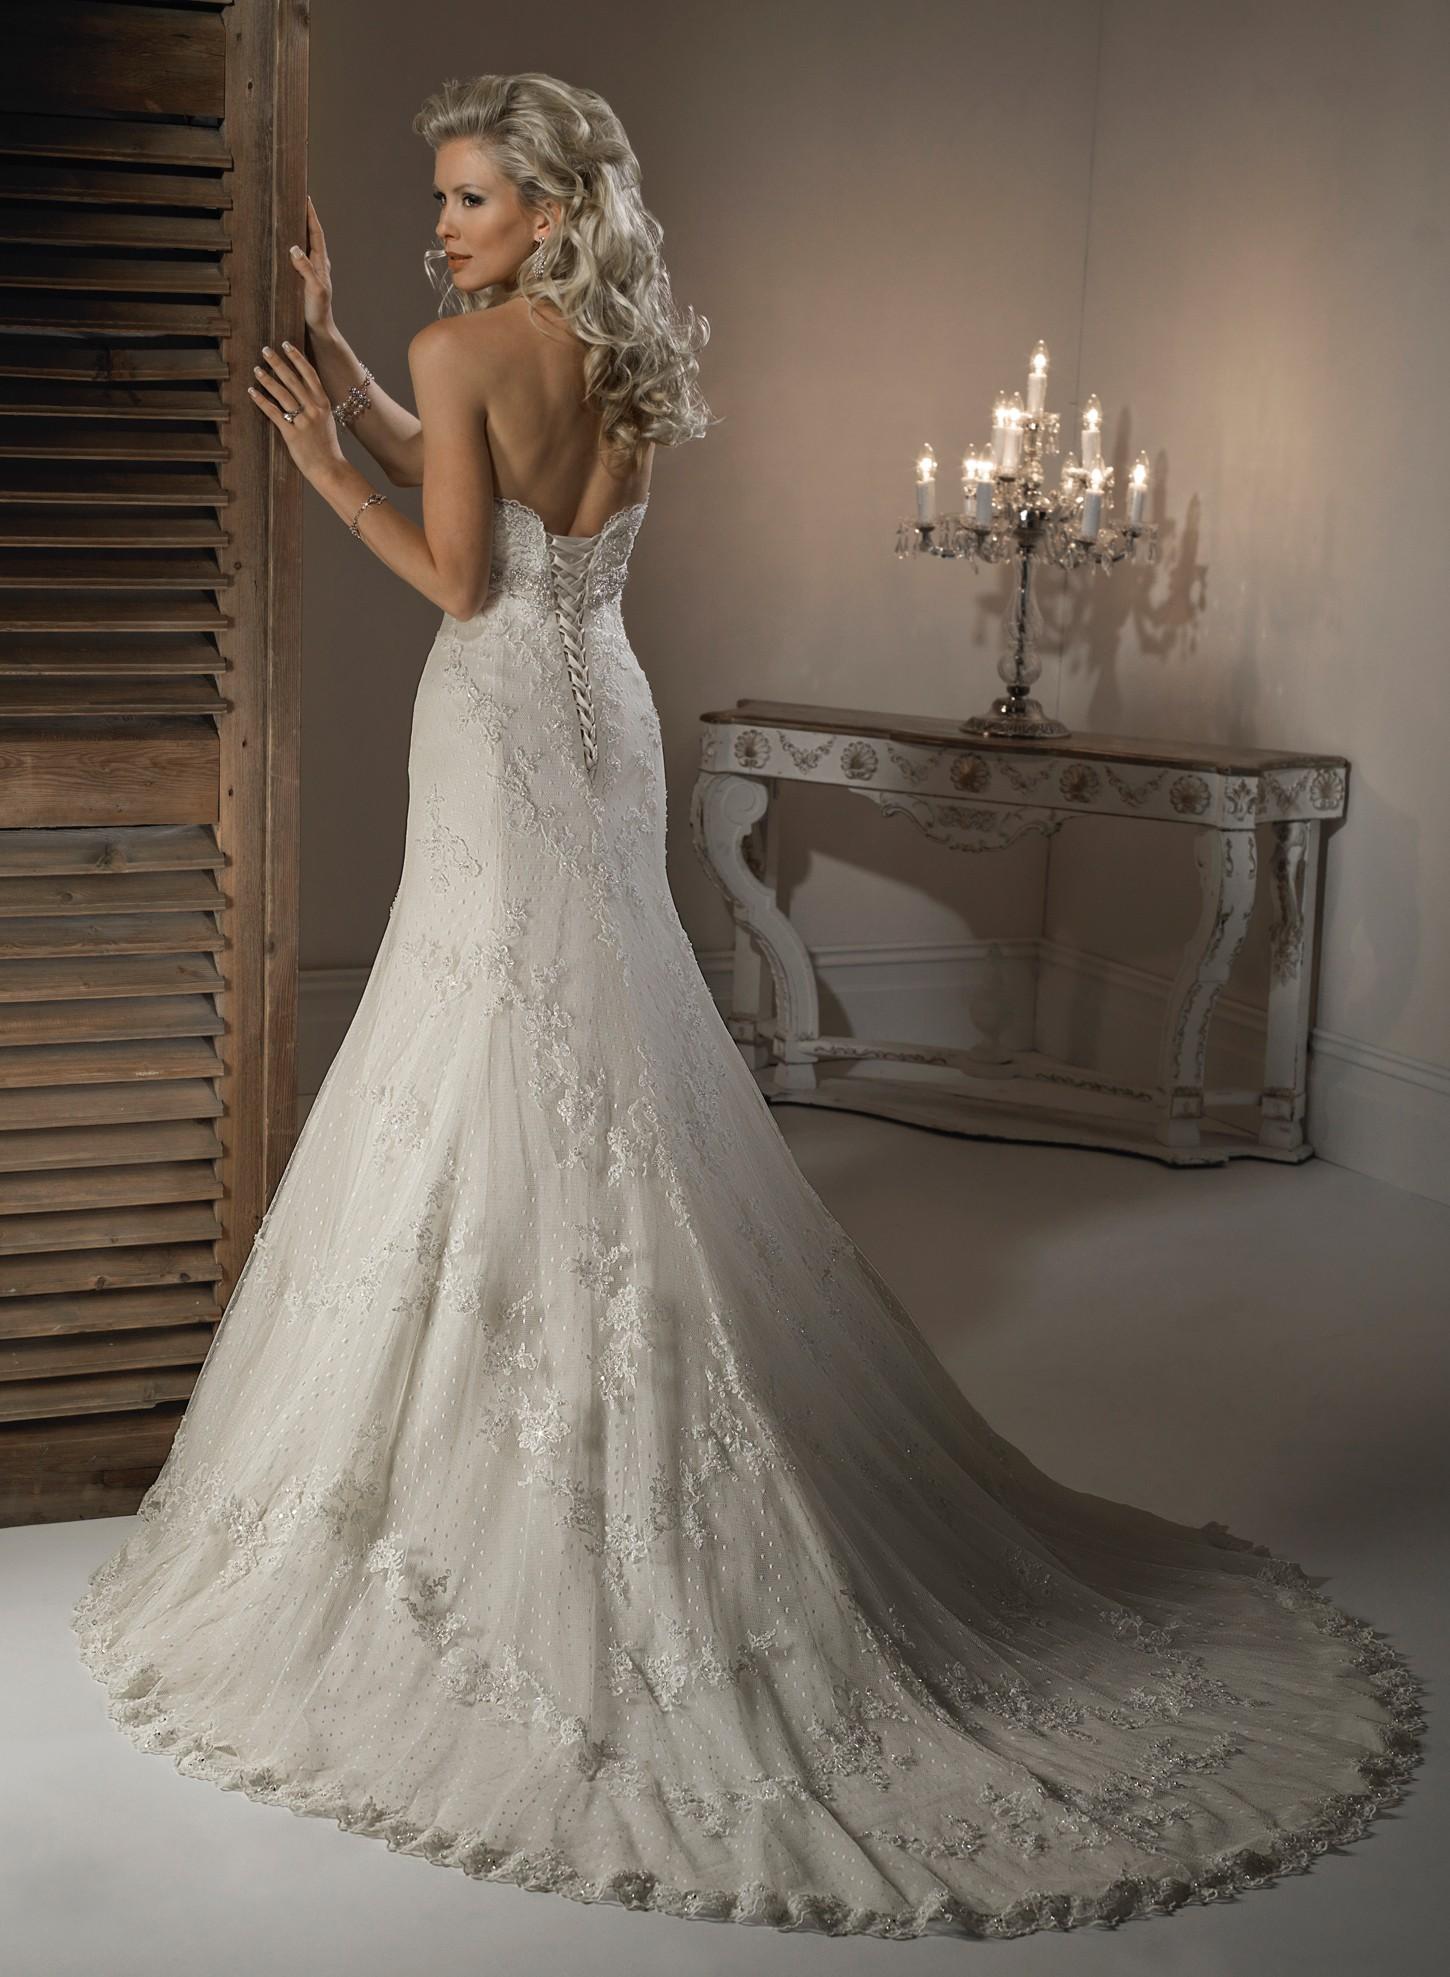 wedding dresses for petite brides photo - 1